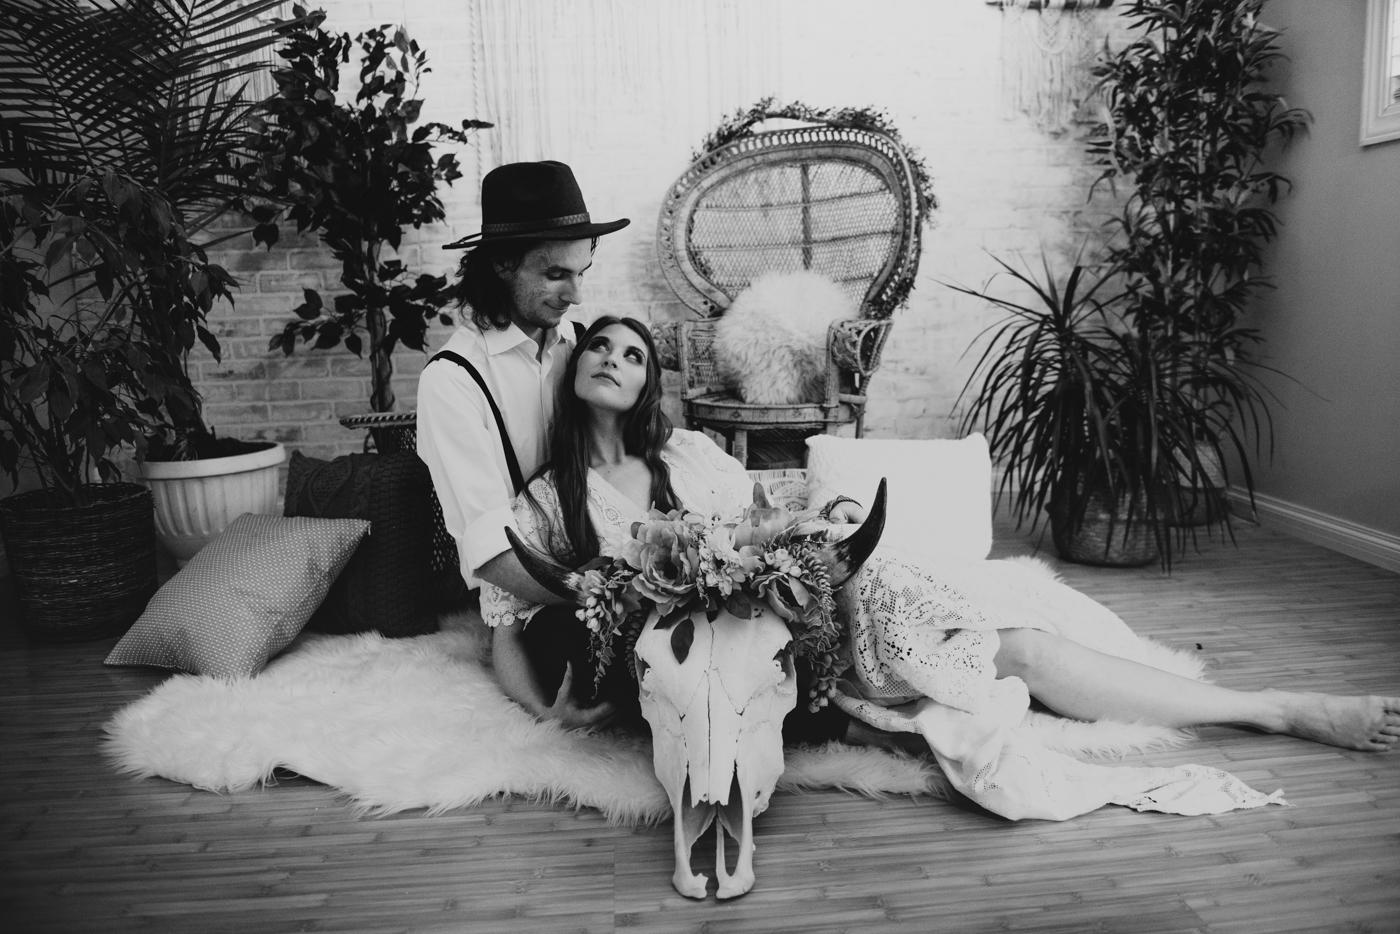 FortSt.John_photographer_TyraEPhotography_Wedding_Couple_Family_Photograhy_DawsonCreek_Elopement_Bride_Boduoir_Portraits-2-2.jpg